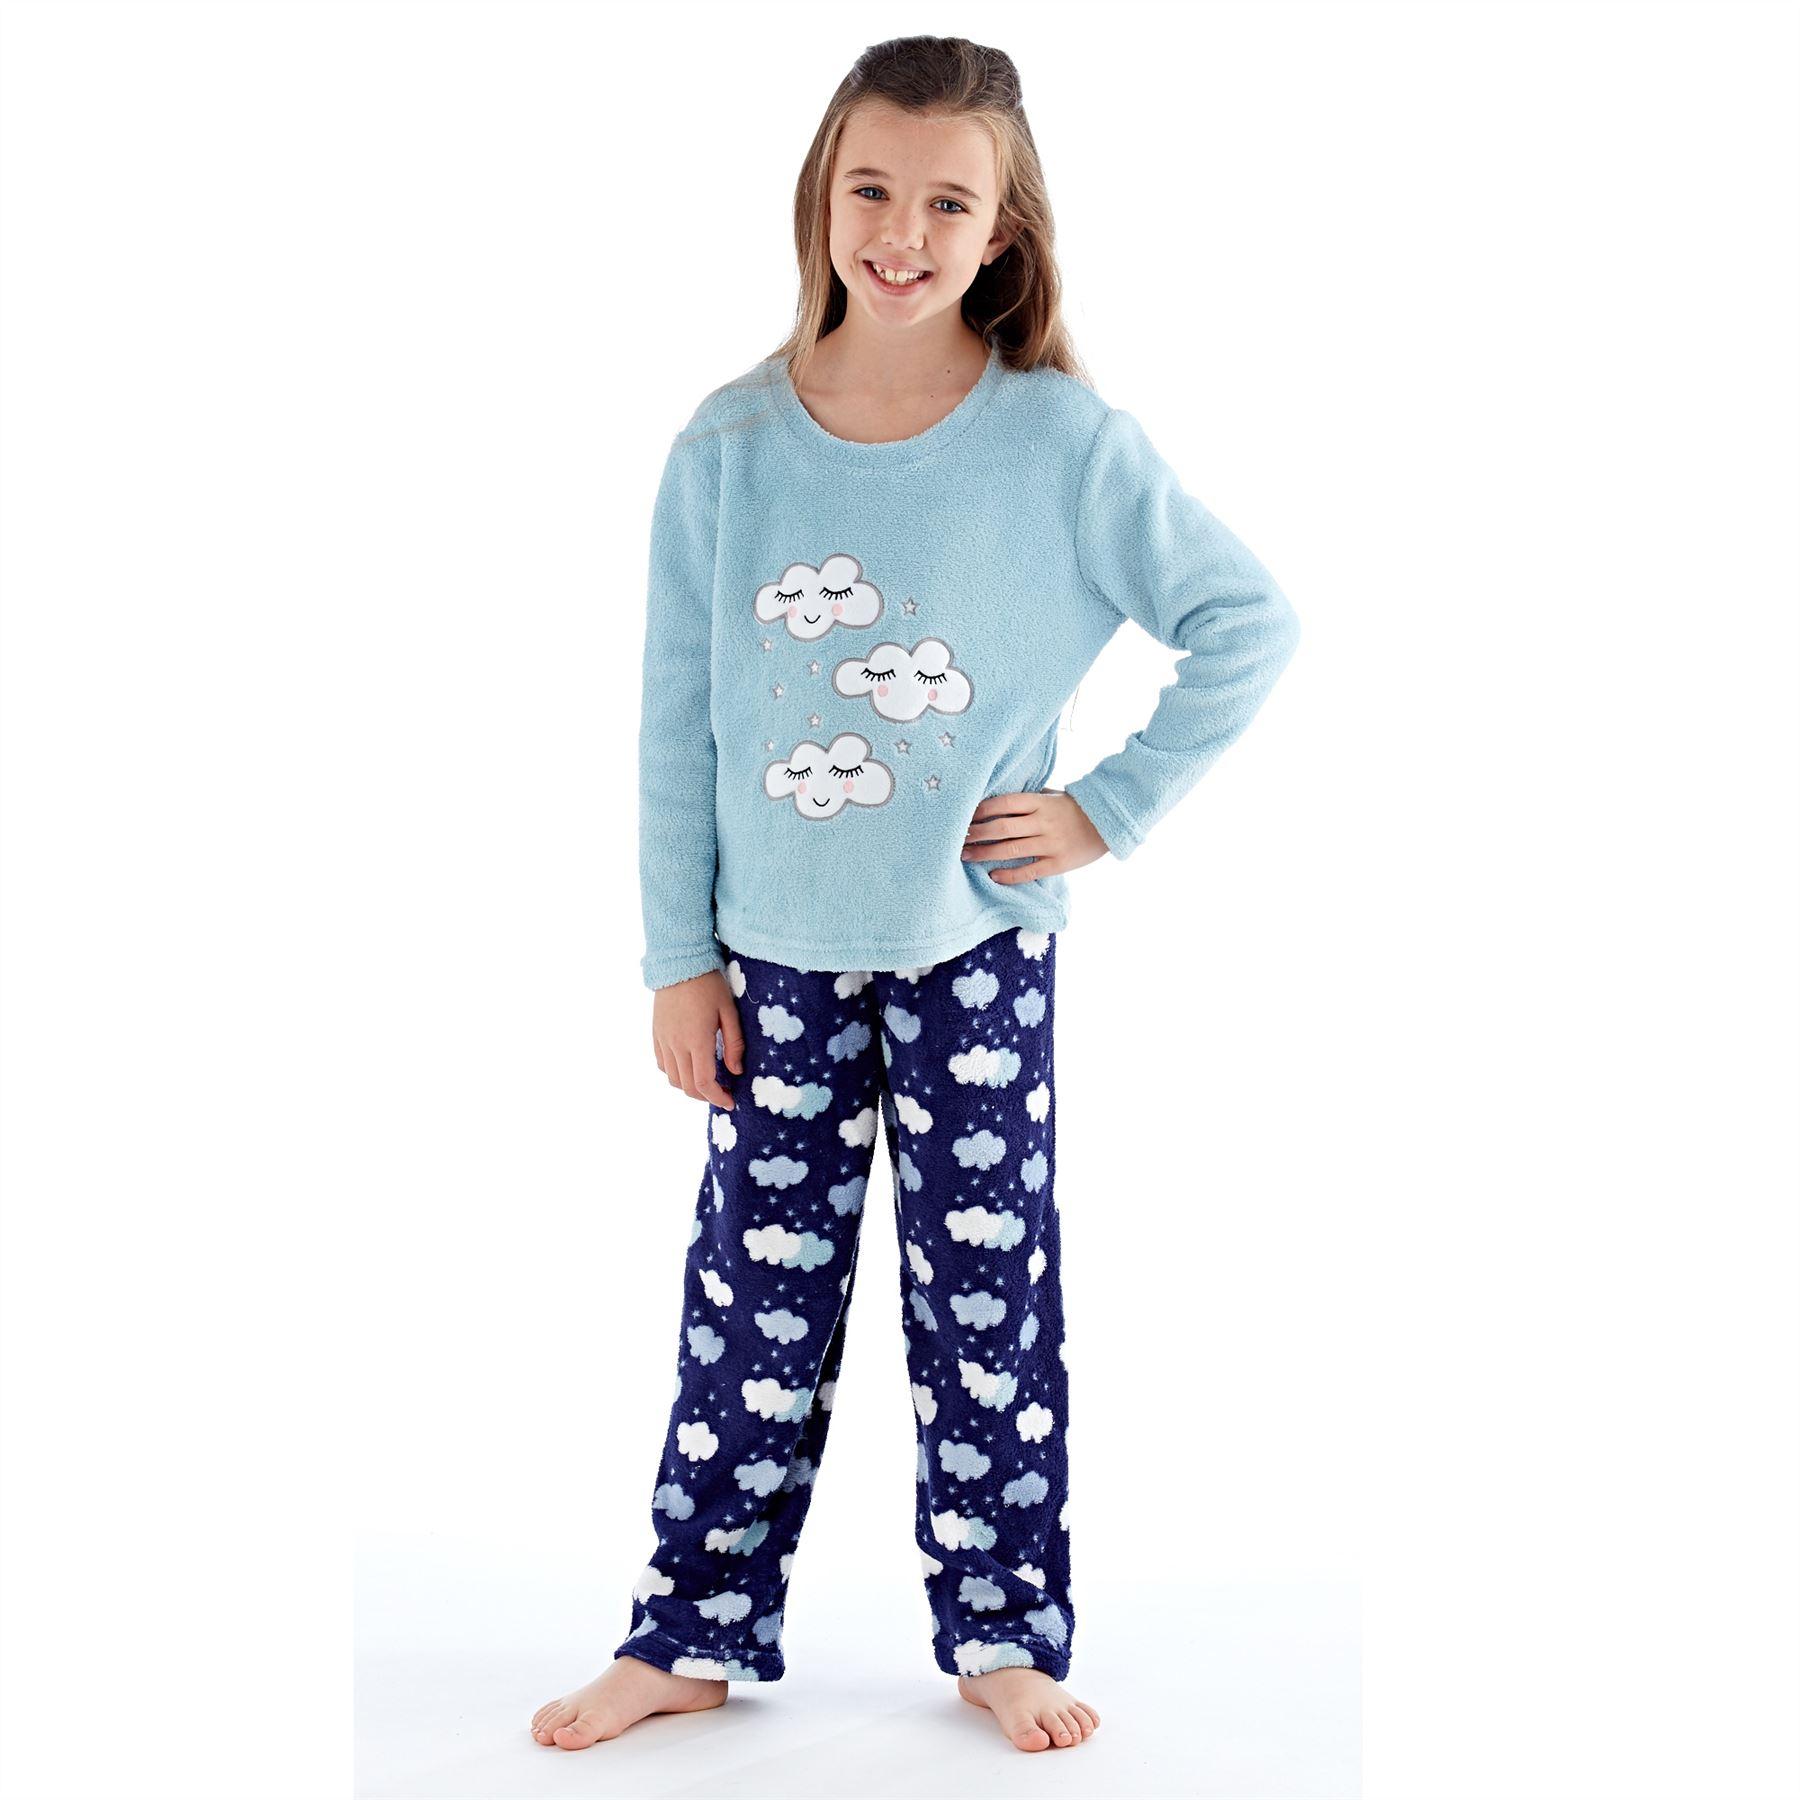 Girls-Boys-Fleece-Pyjamas-Childrens-Pyjama-Set-Kids-PJs-Age-2-13-Years thumbnail 20